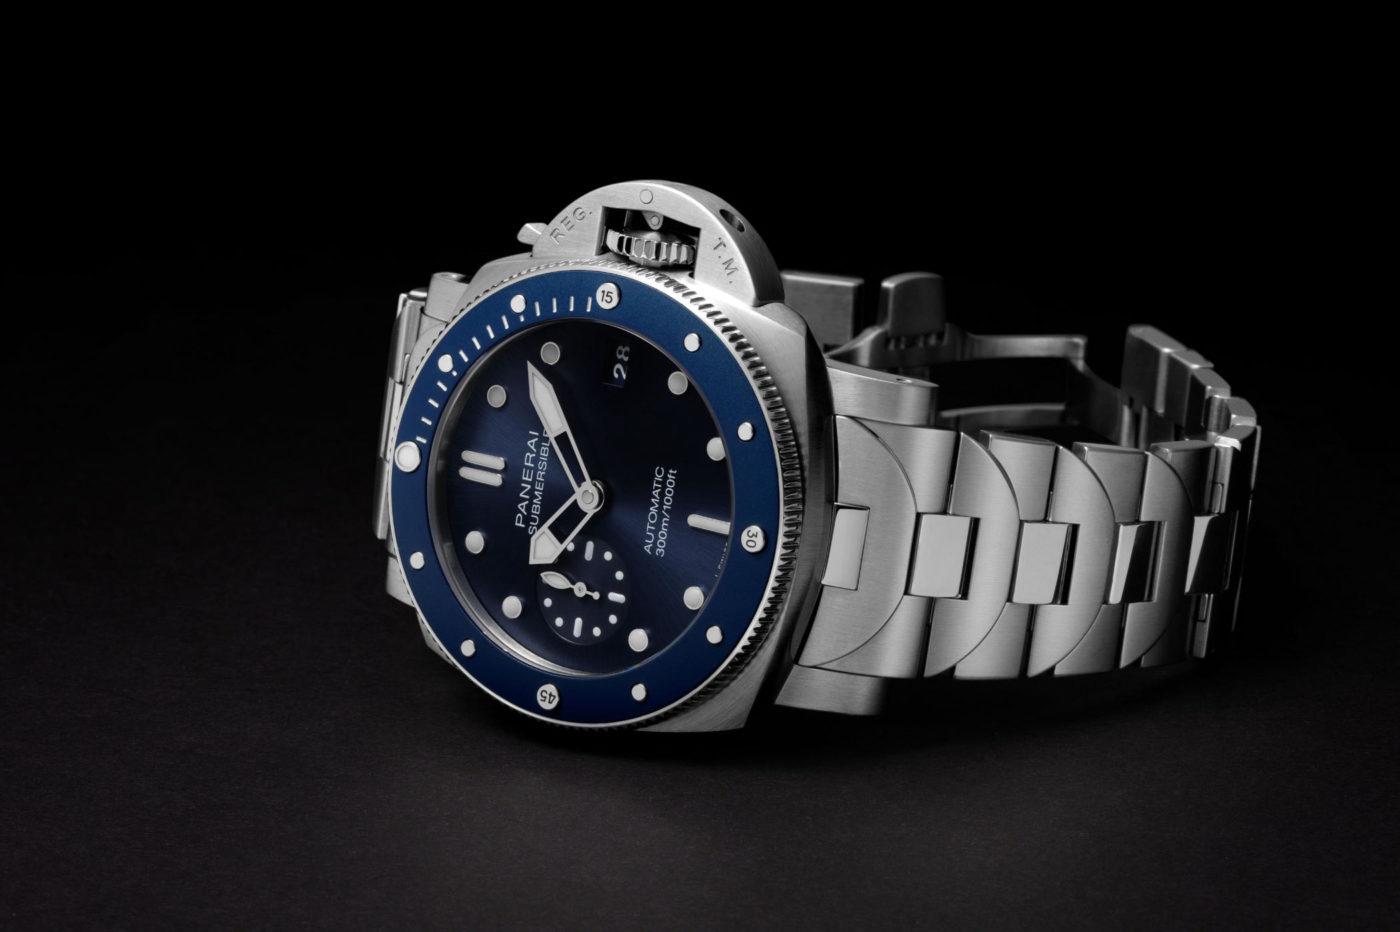 Panerai Submersible Blu Notte PAM01068 [dostępność, cena]